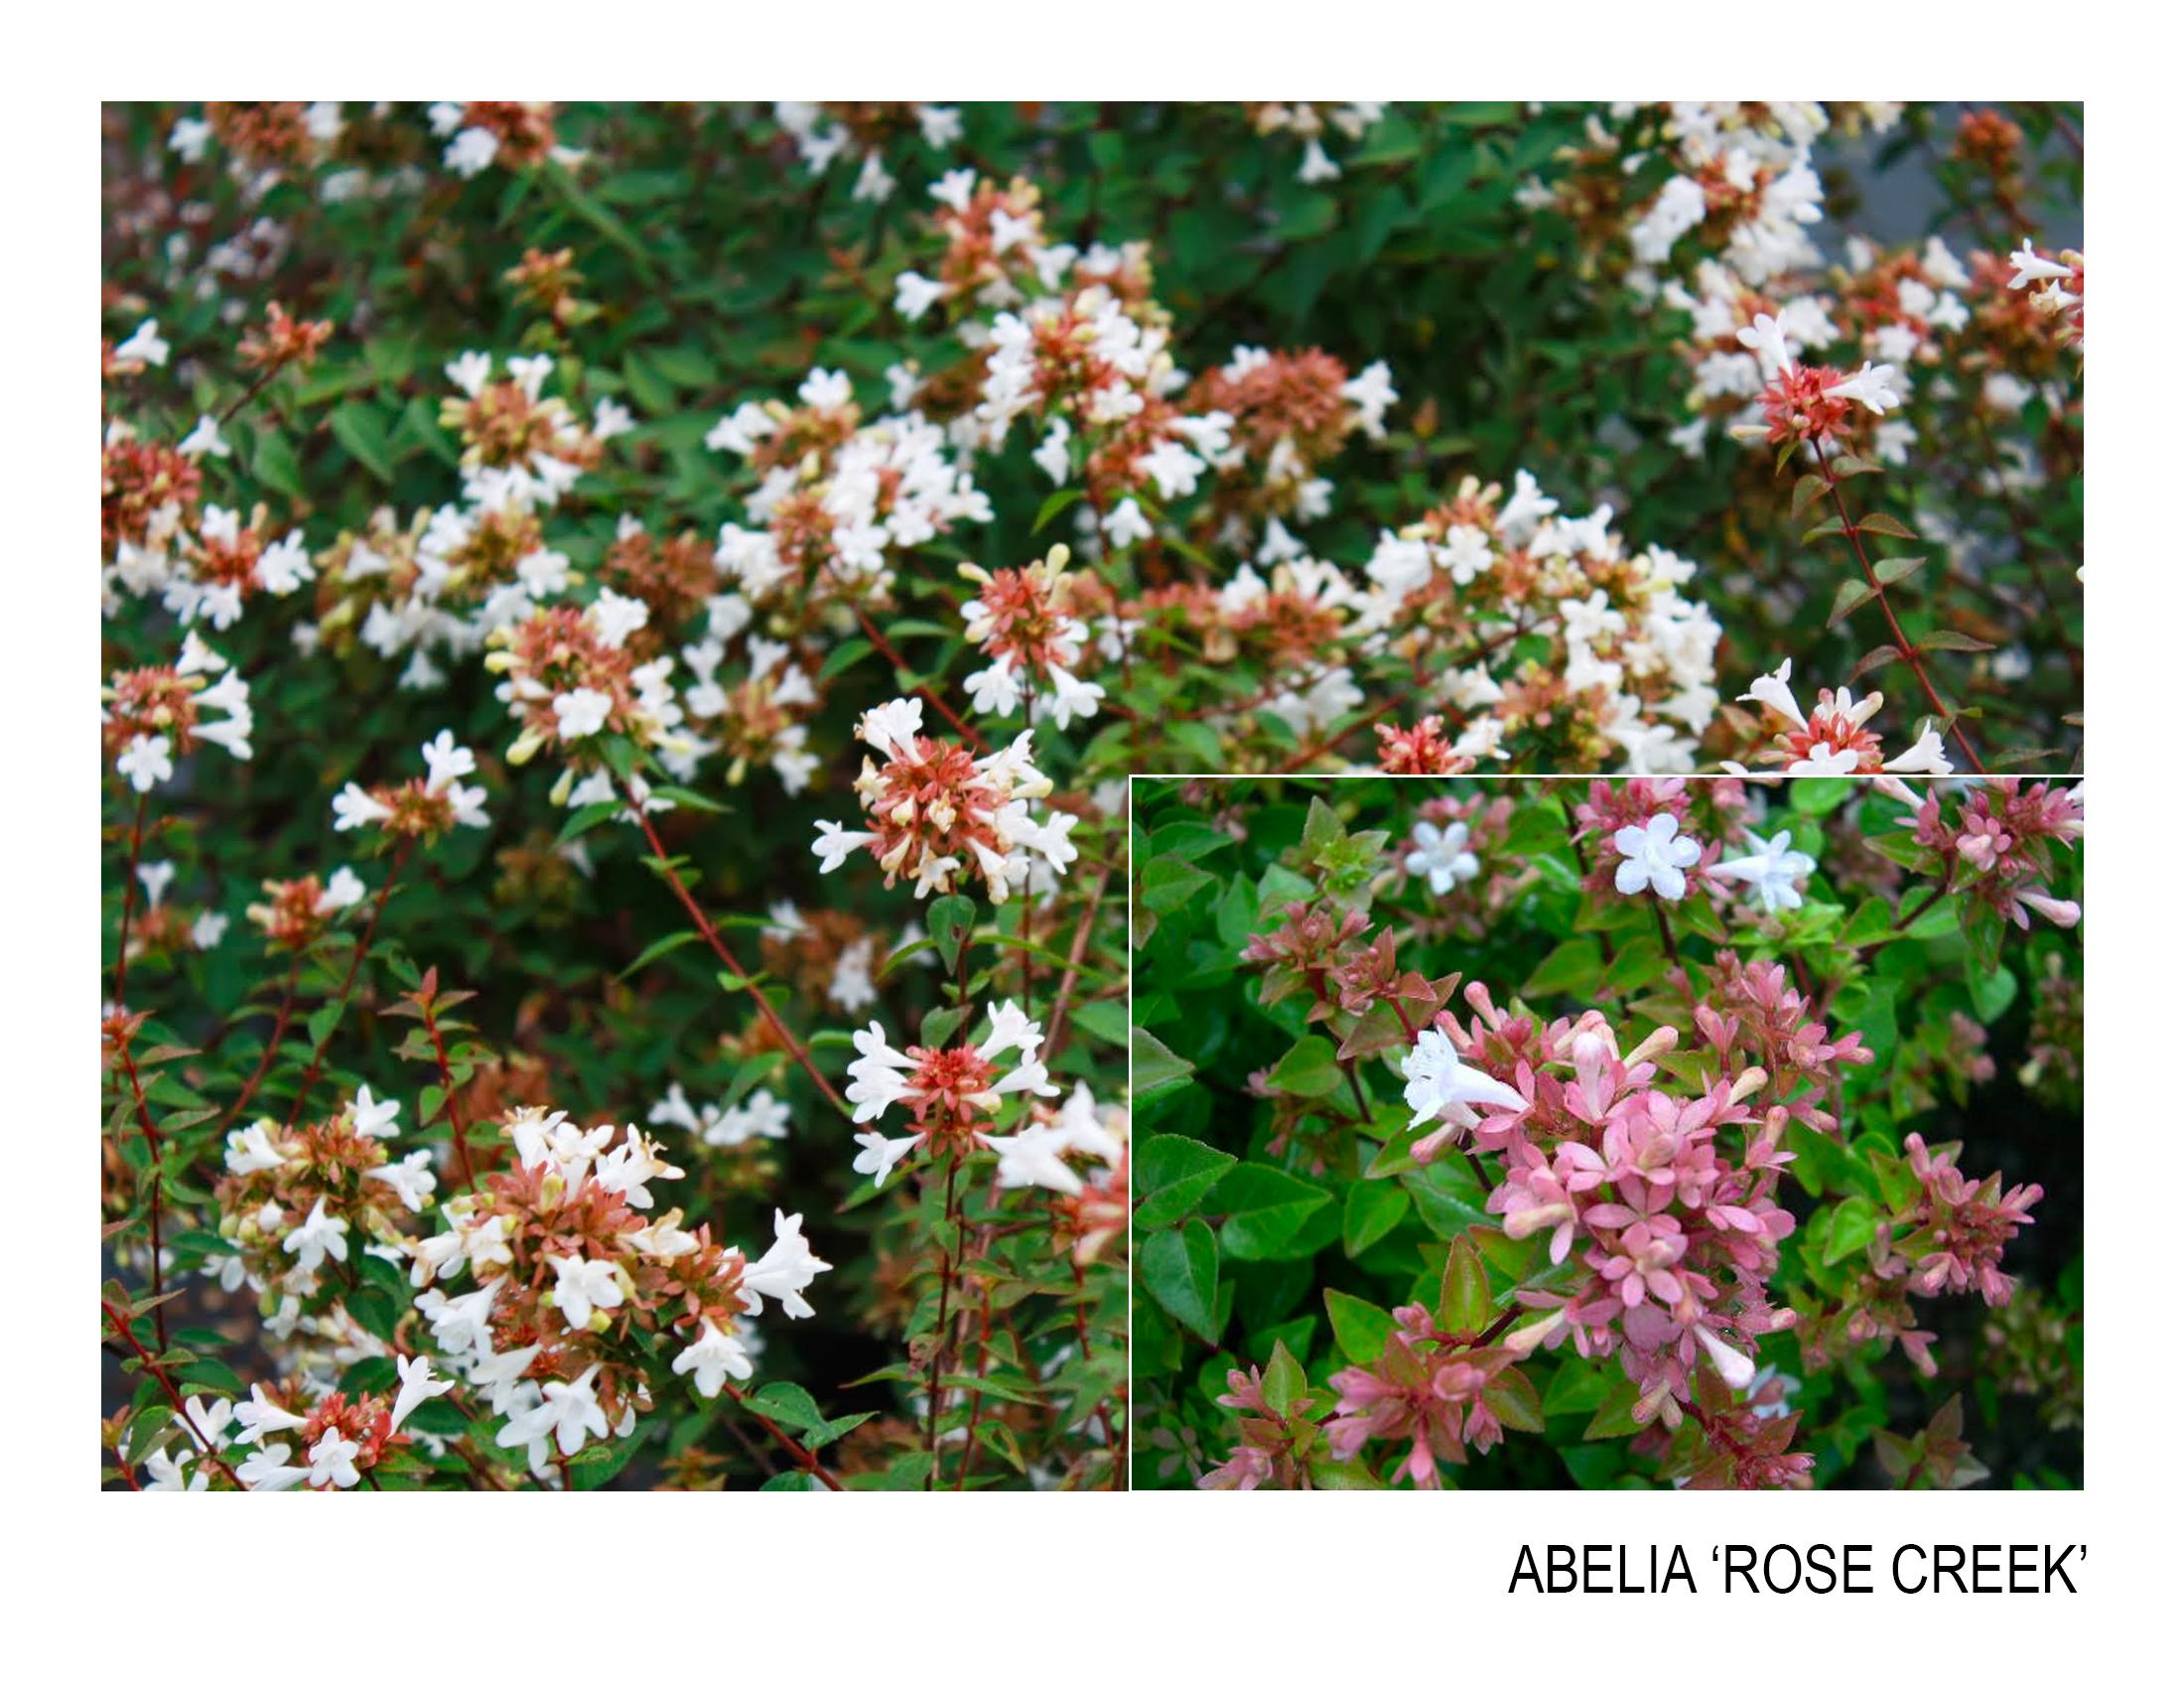 abelia rose creek.jpg